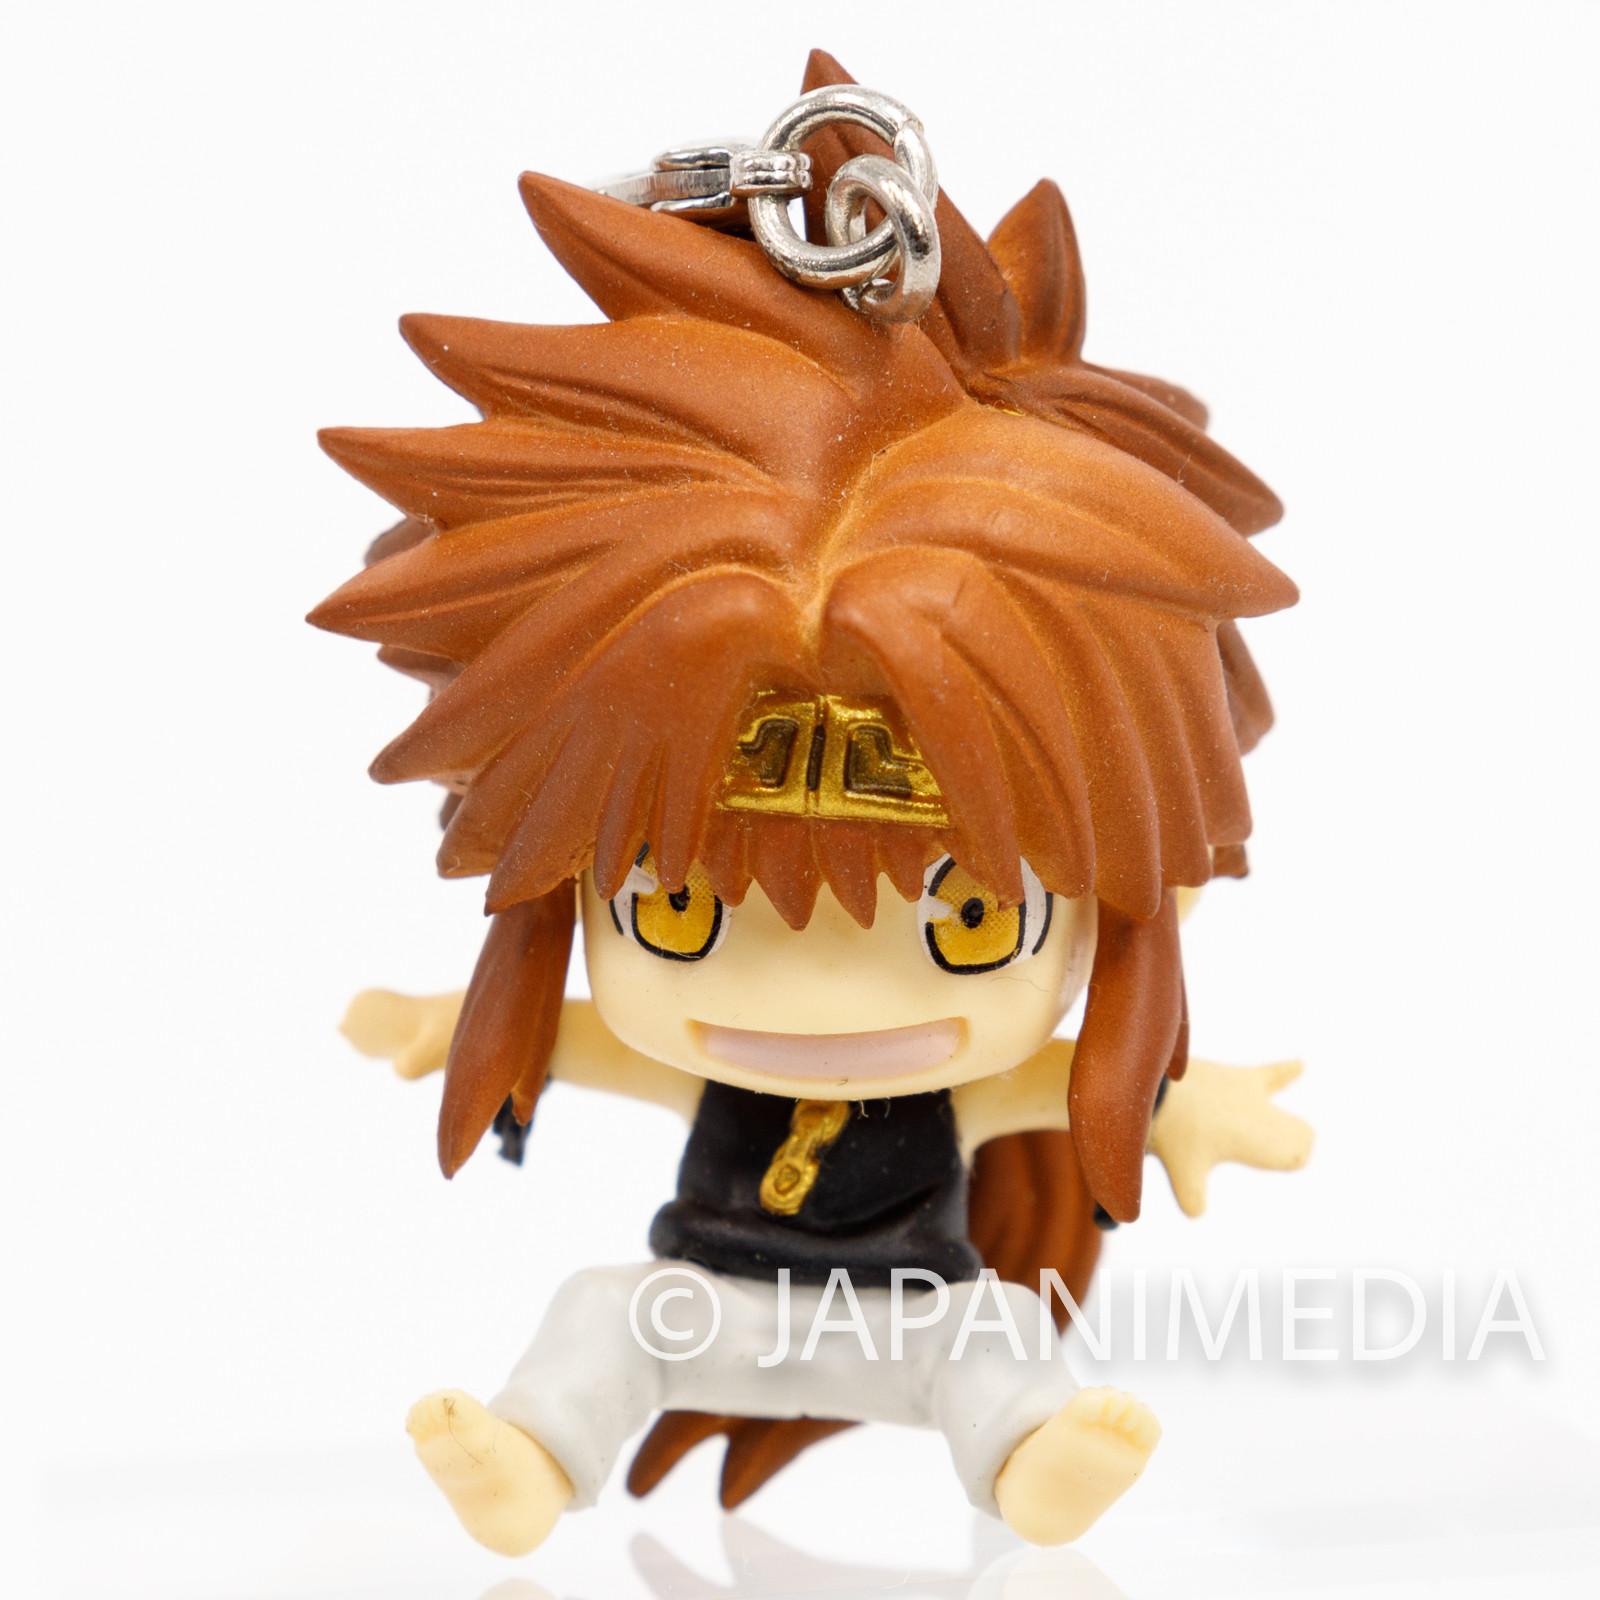 SAIYUKI Son Goku Gaiden ver. KaraCole Mascot Figure Movic Kazuya Minekura JAPAN